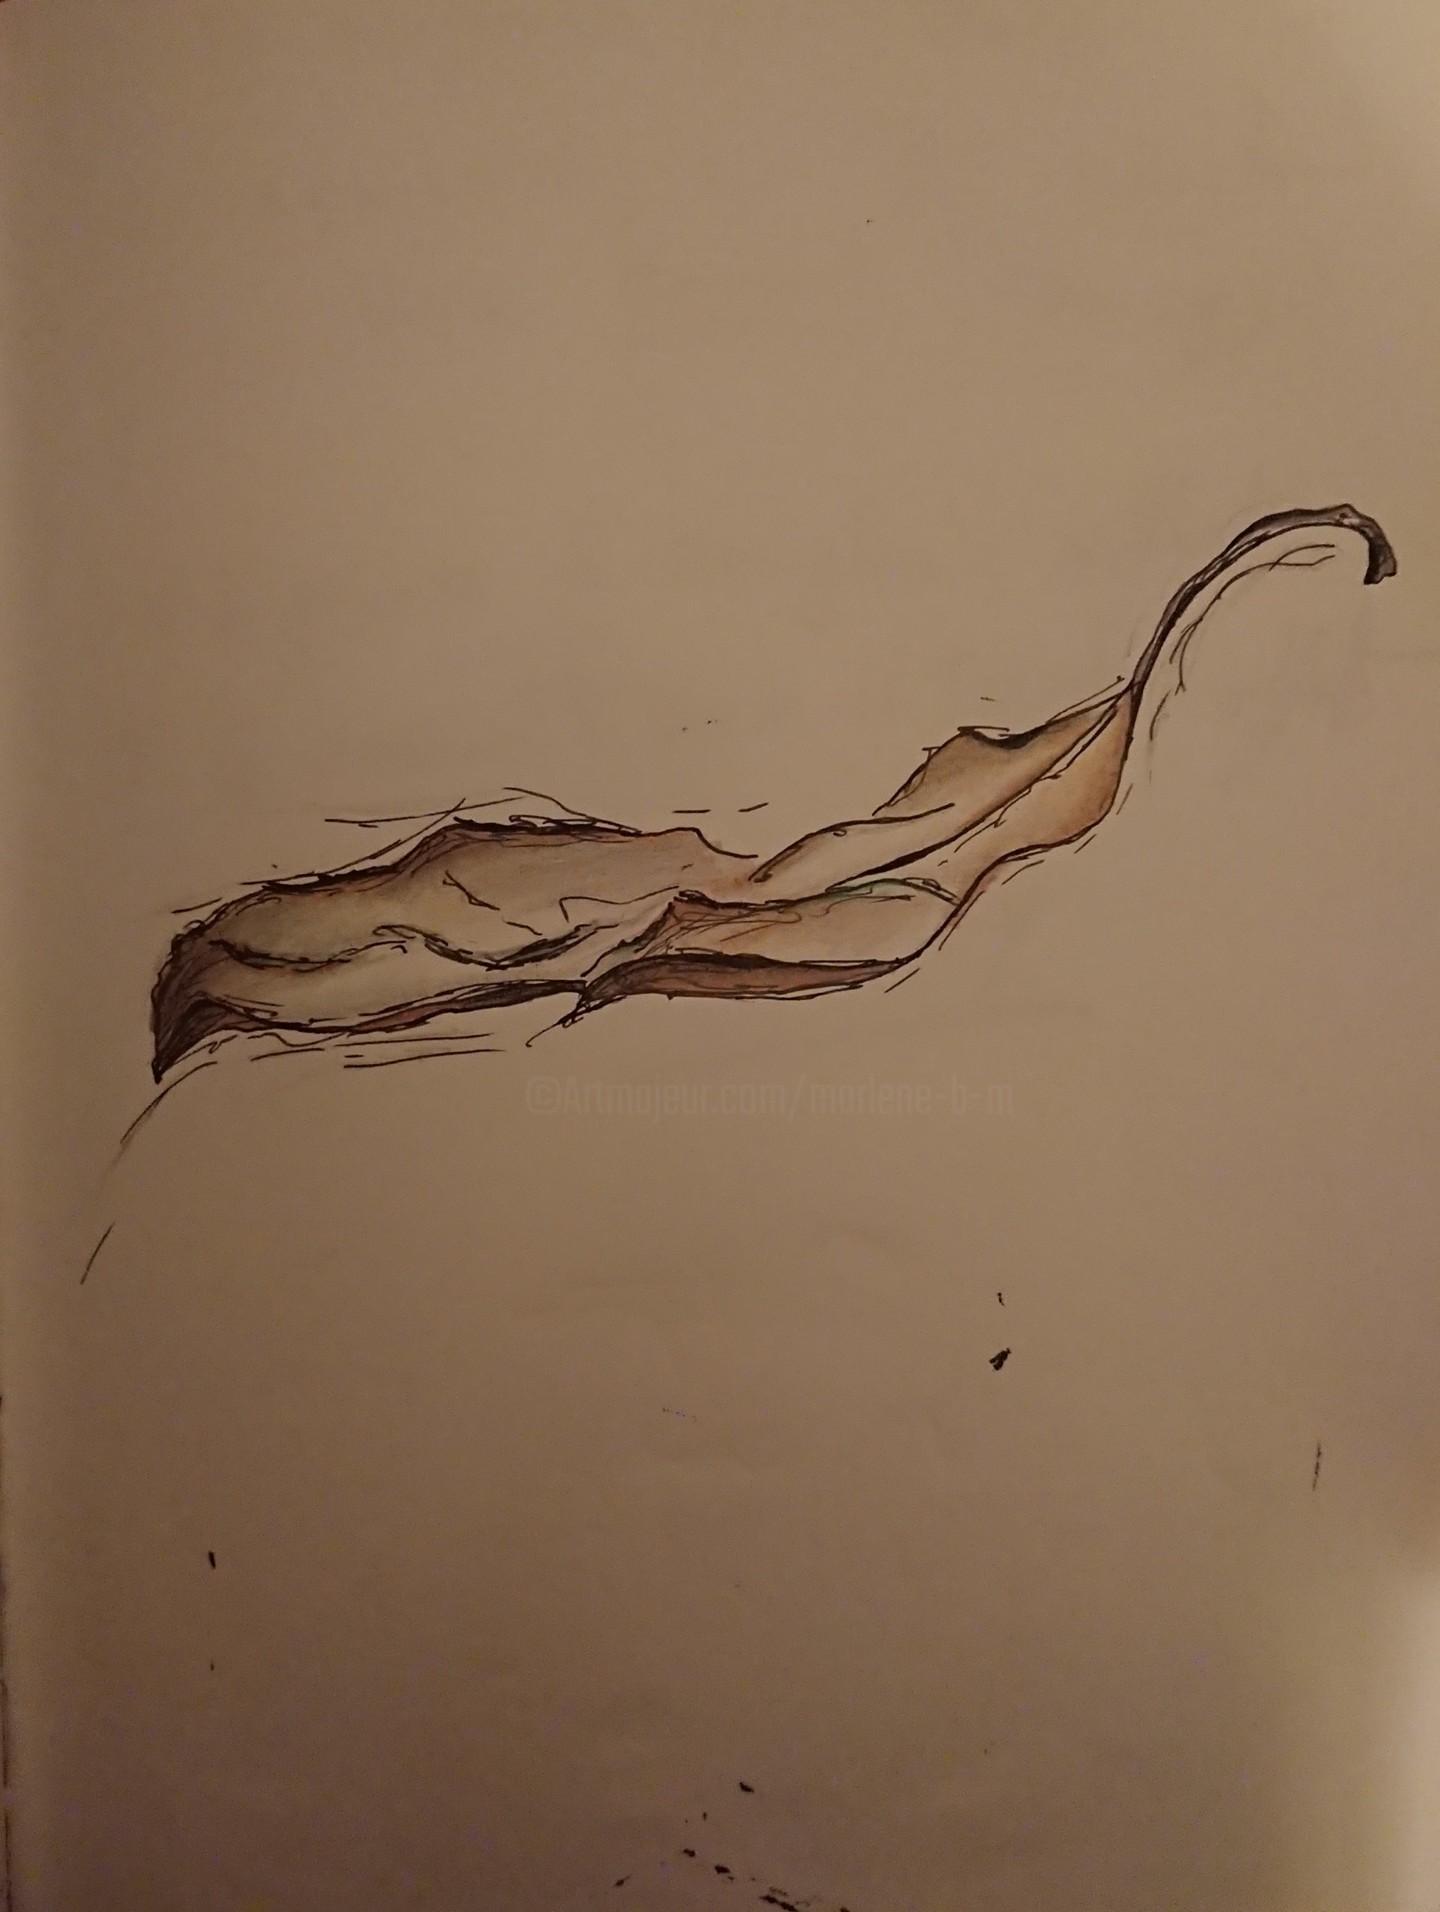 Marlène Bonnaffé - Feuille feuille